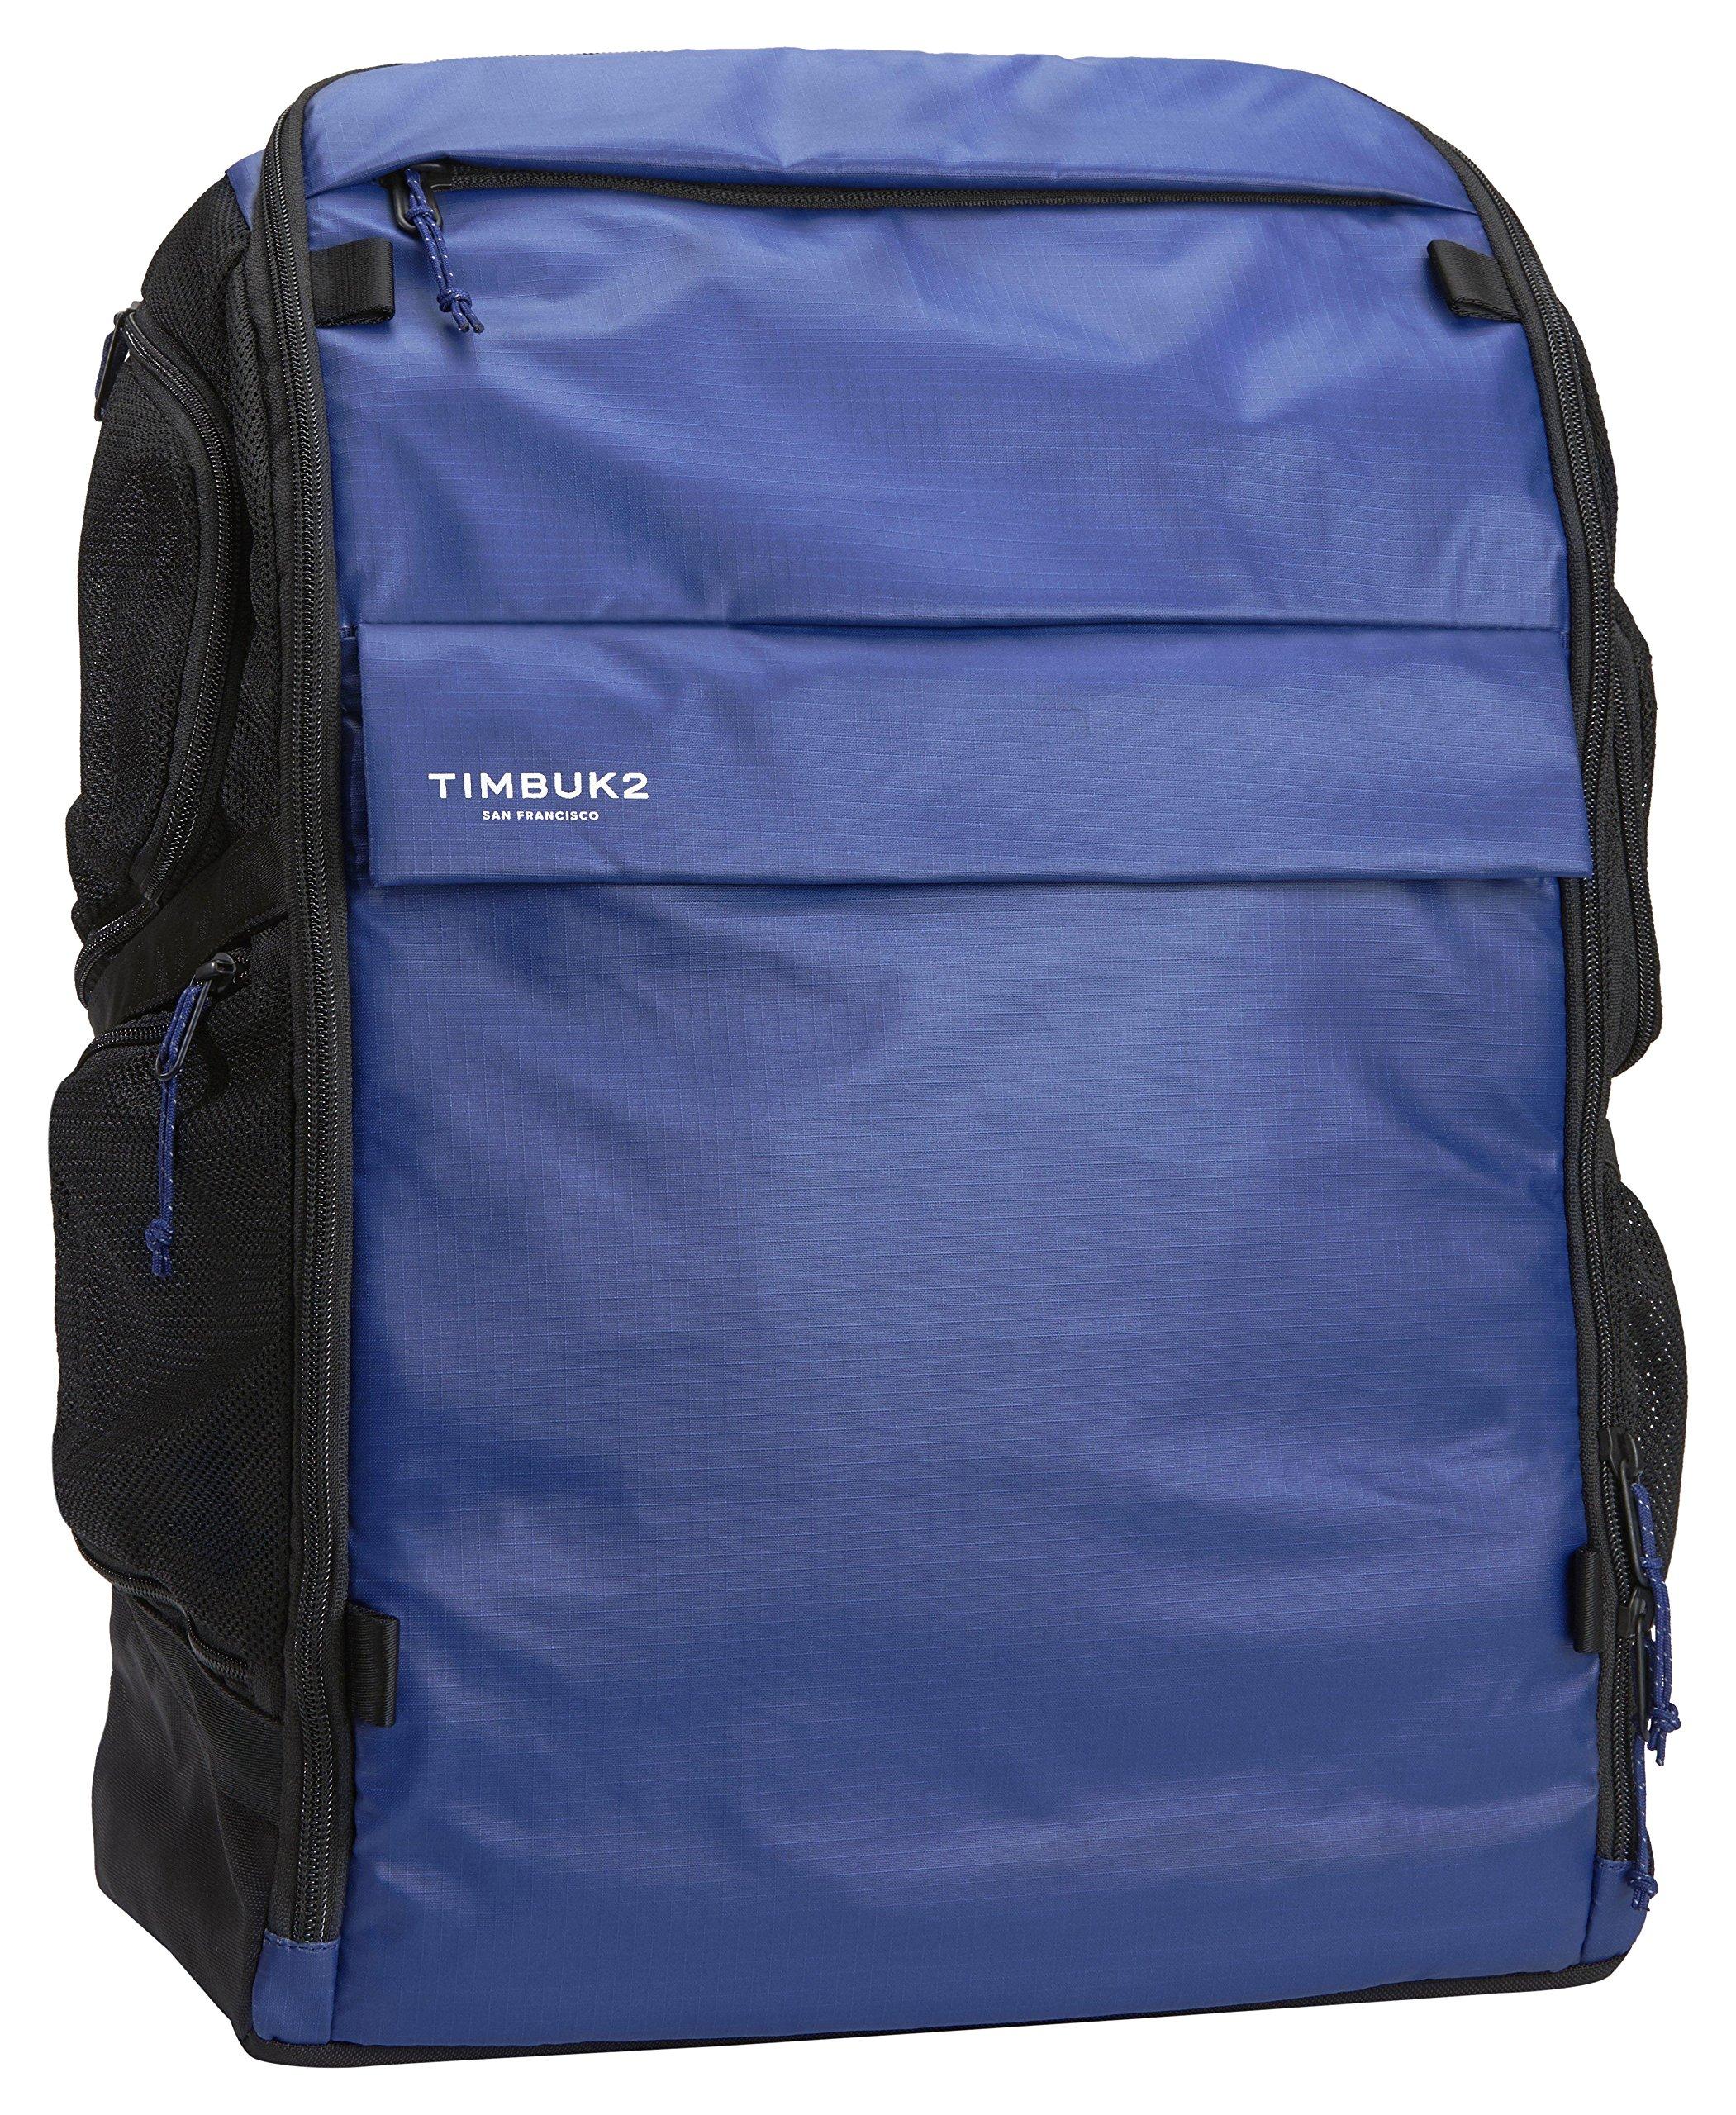 Timbuk2 Muttmover Light Daypack, Blue Wish Light Rip, Medium